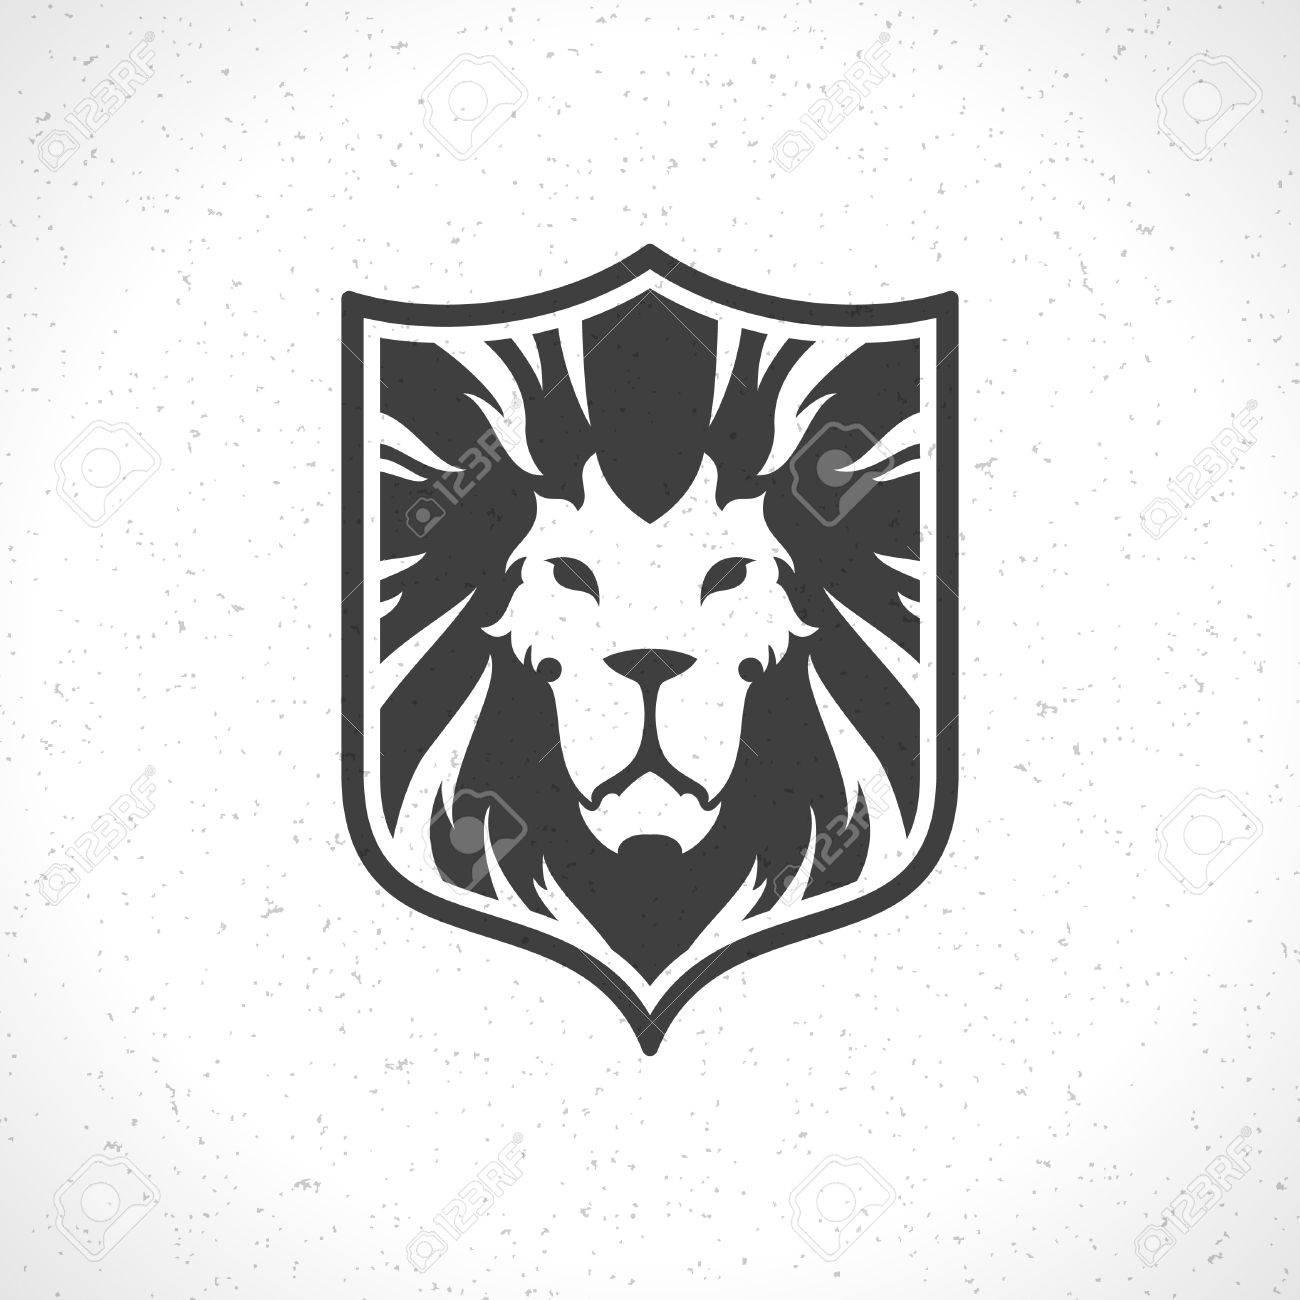 Shirt design vector - Lion Face Icon Emblem Template For Business Or T Shirt Design Vector Vintage Design